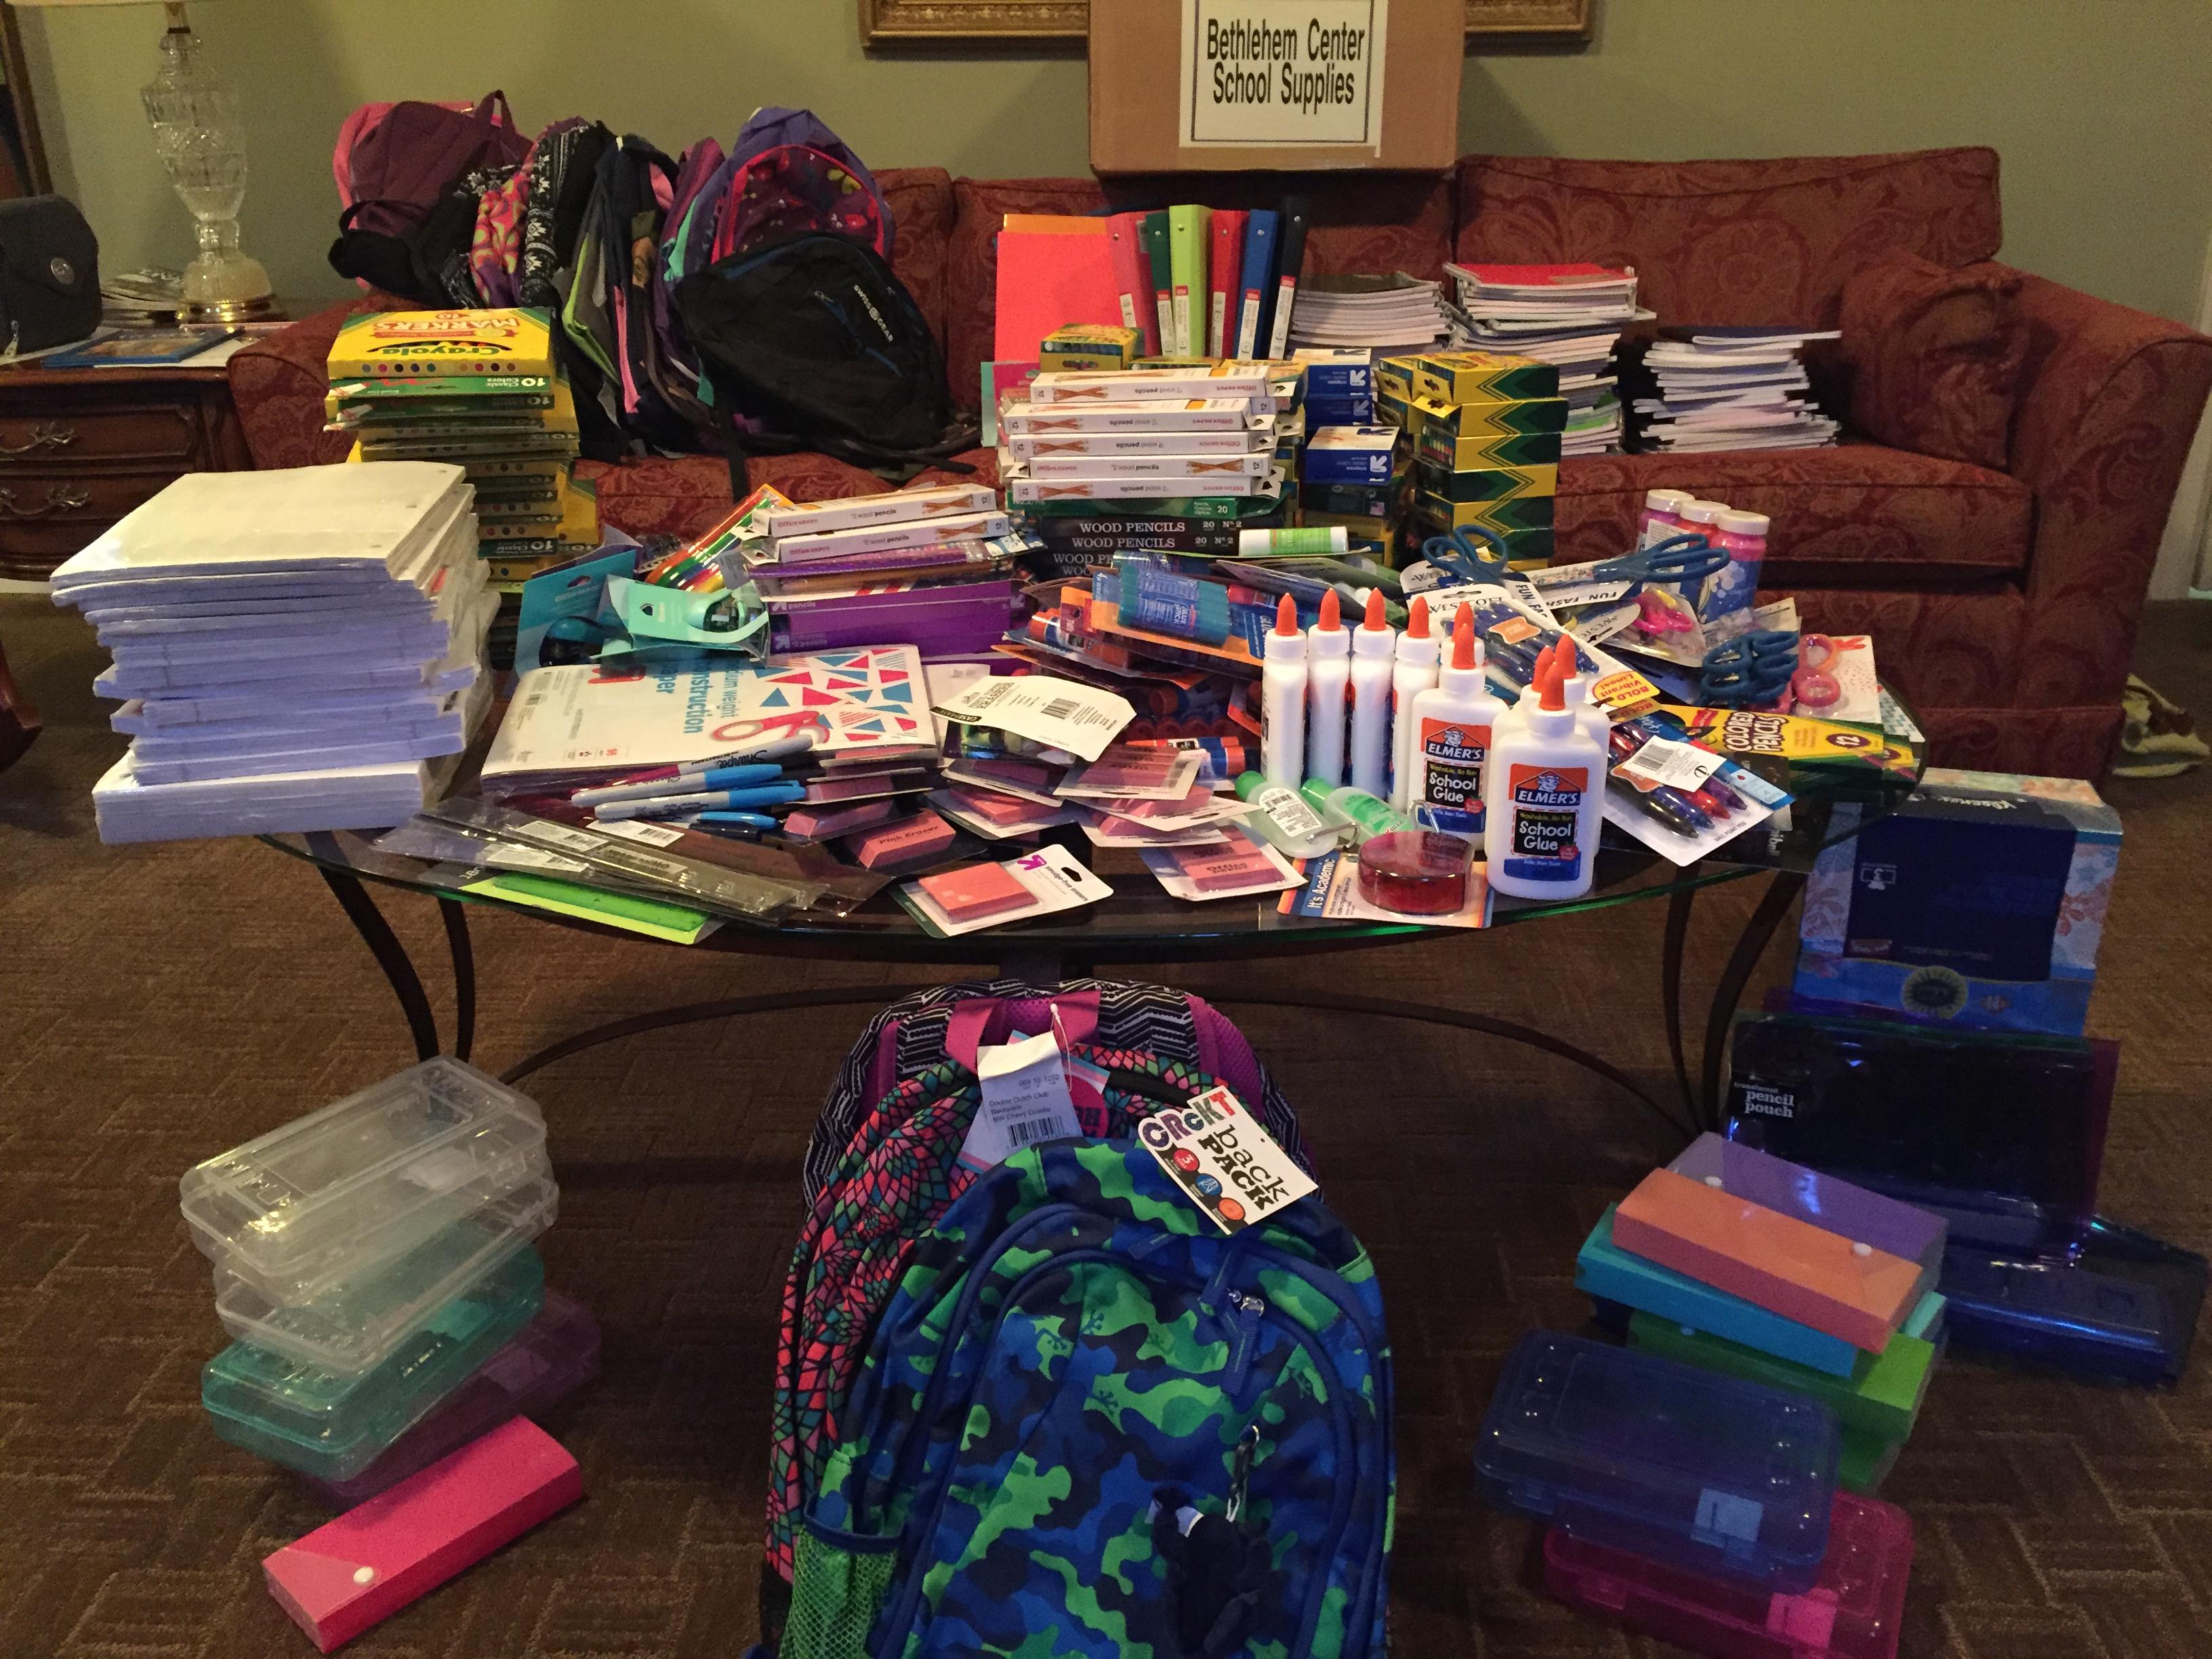 Bethlehem Center supplies 2016